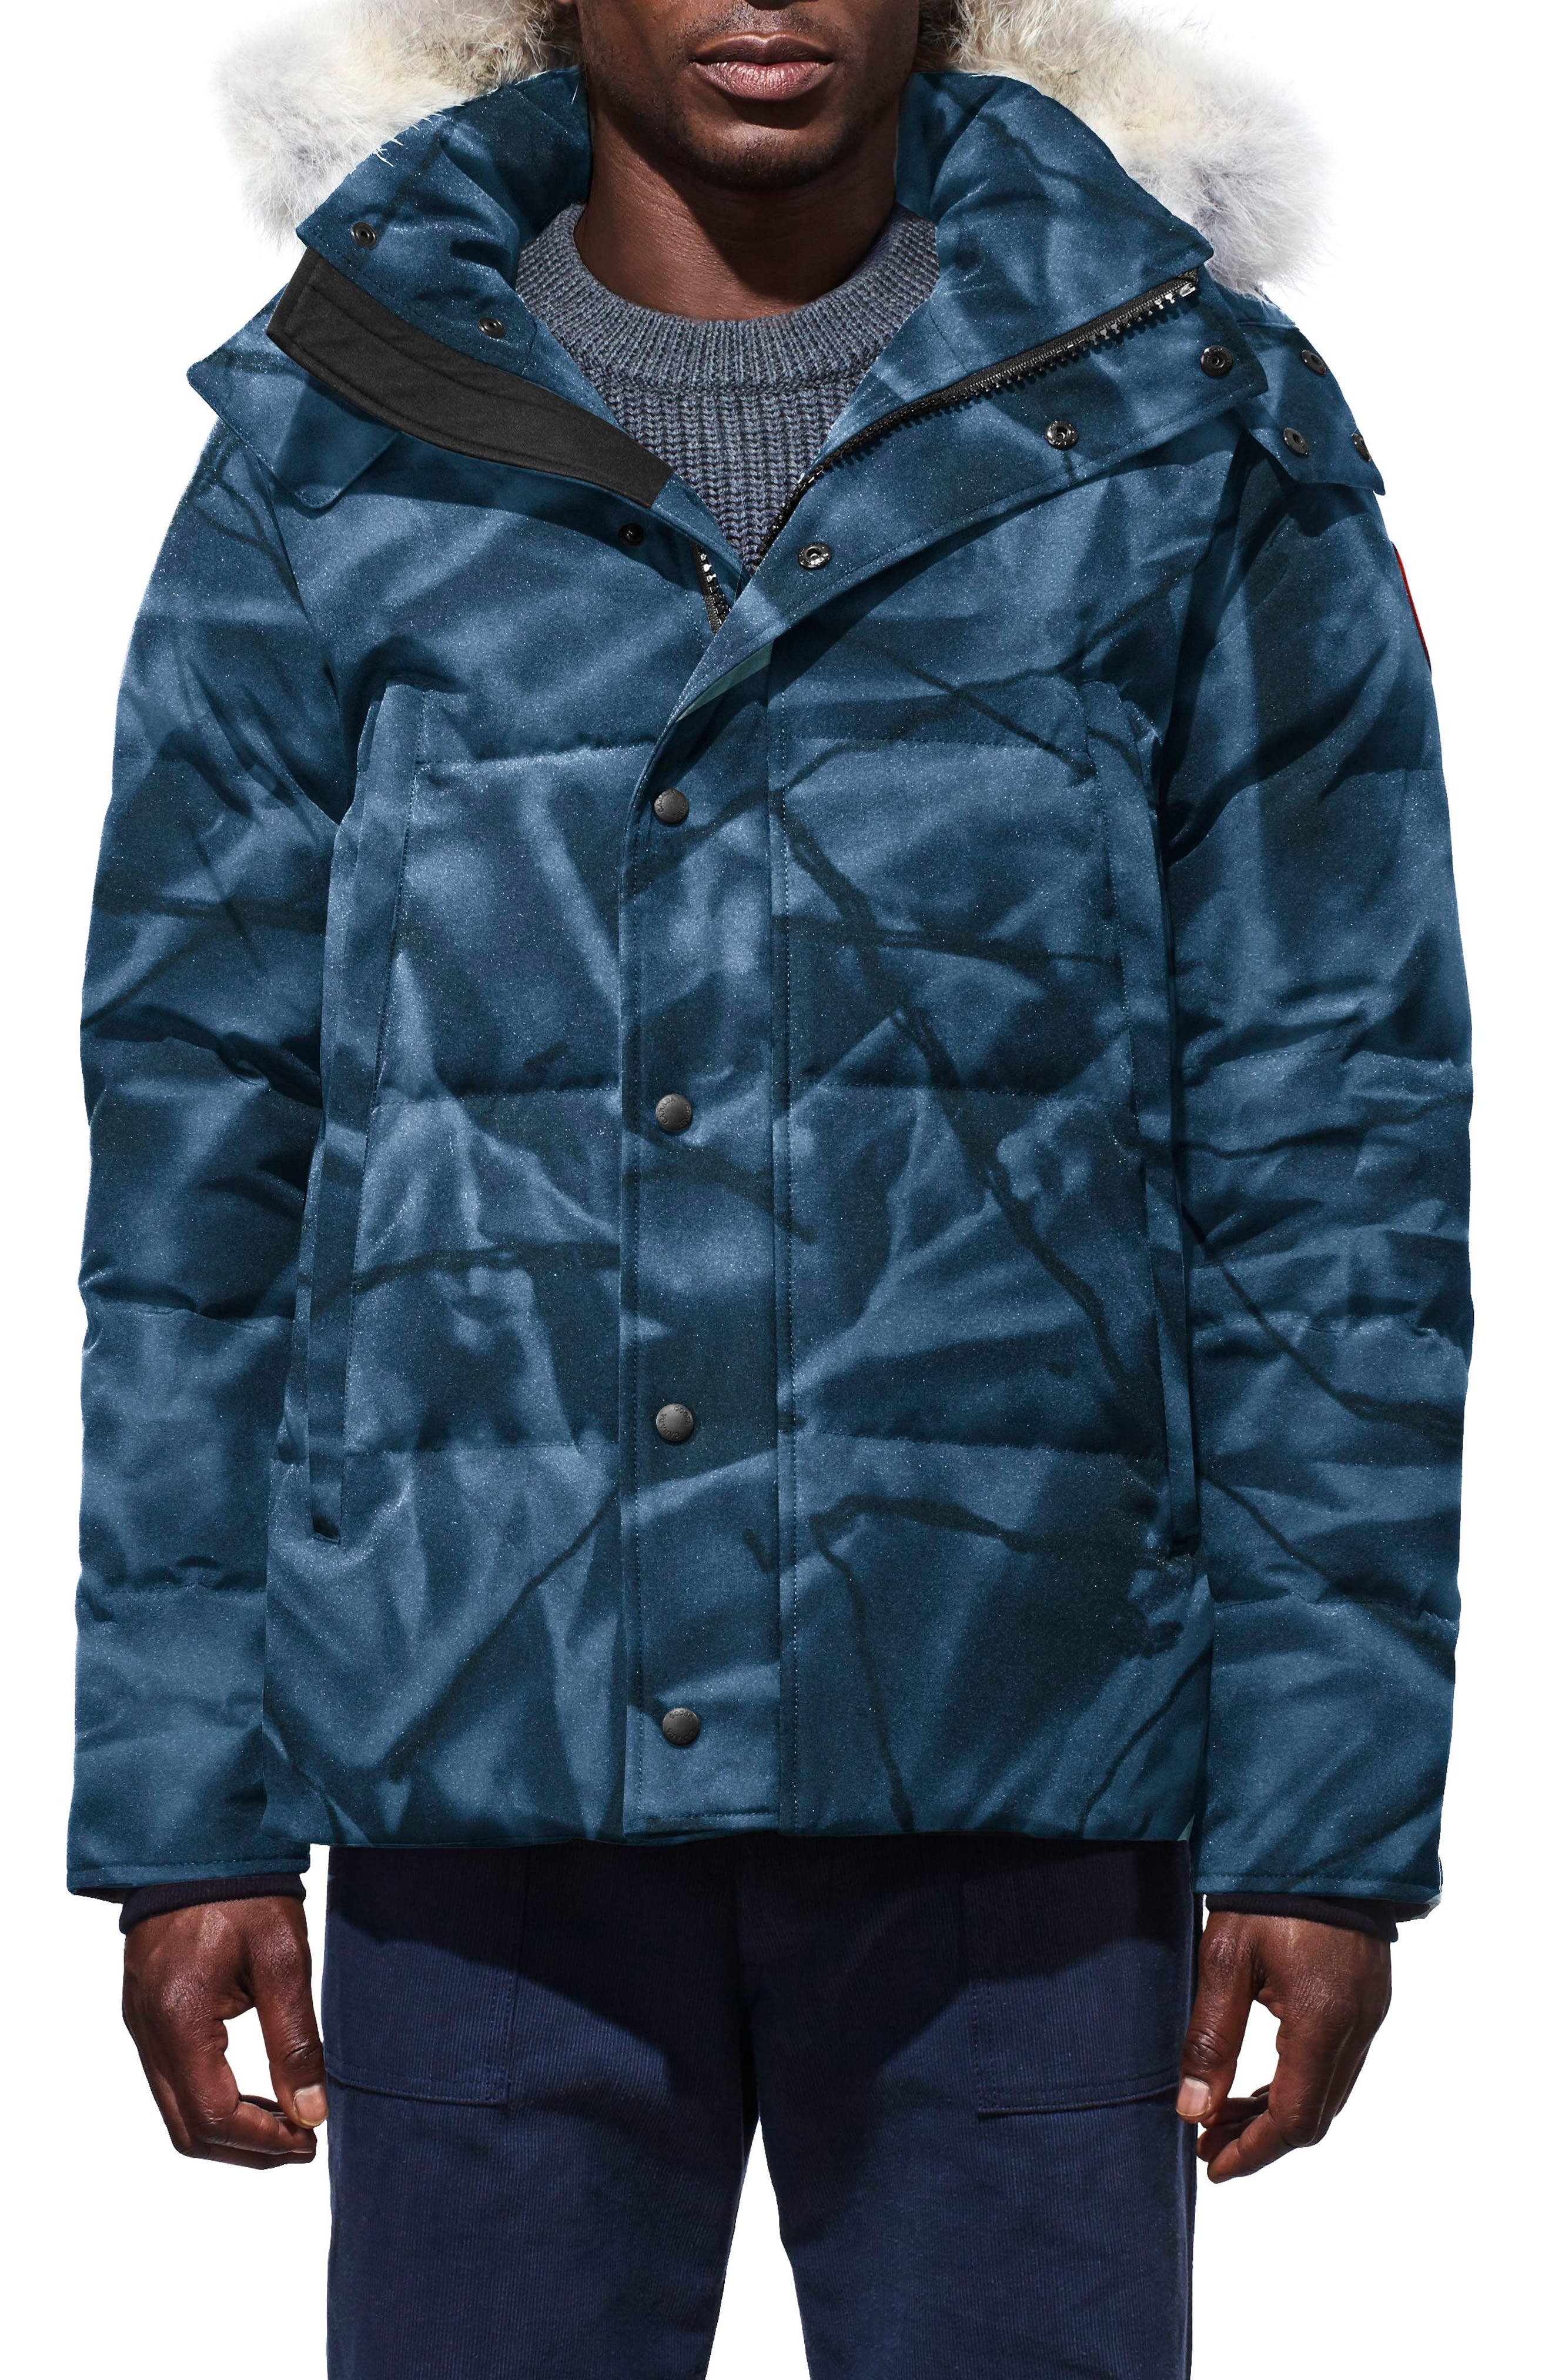 Wyndham Slim Fit Genuine Coyote Fur Trim Down Jacket,                         Main,                         color, BLUE ABSTRACT CAMO